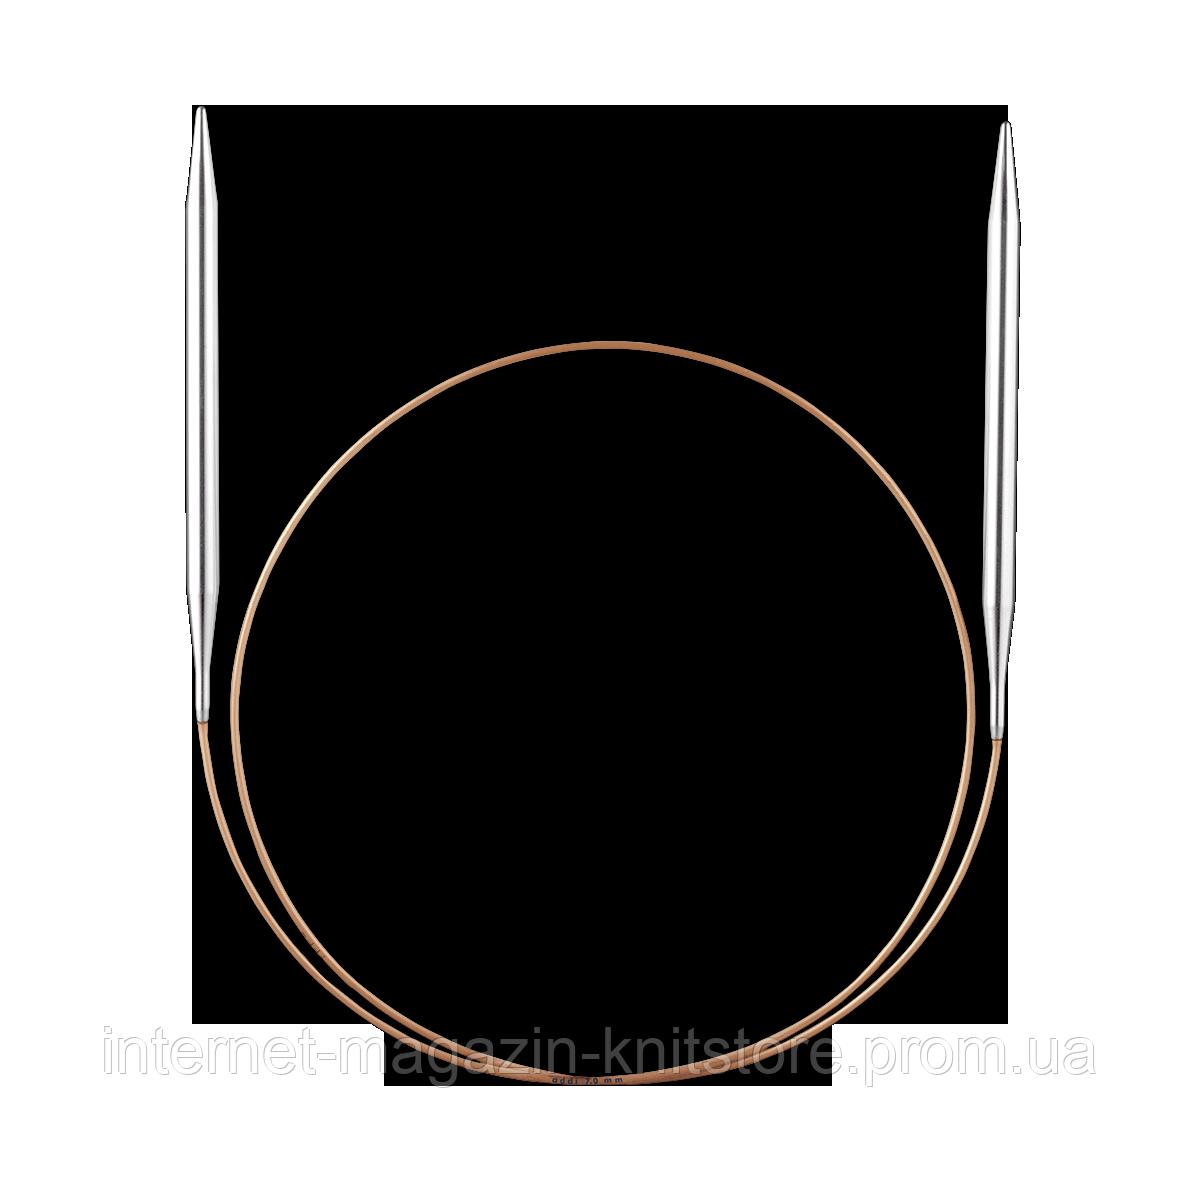 Спицы Addi 80 см/2 мм круговые